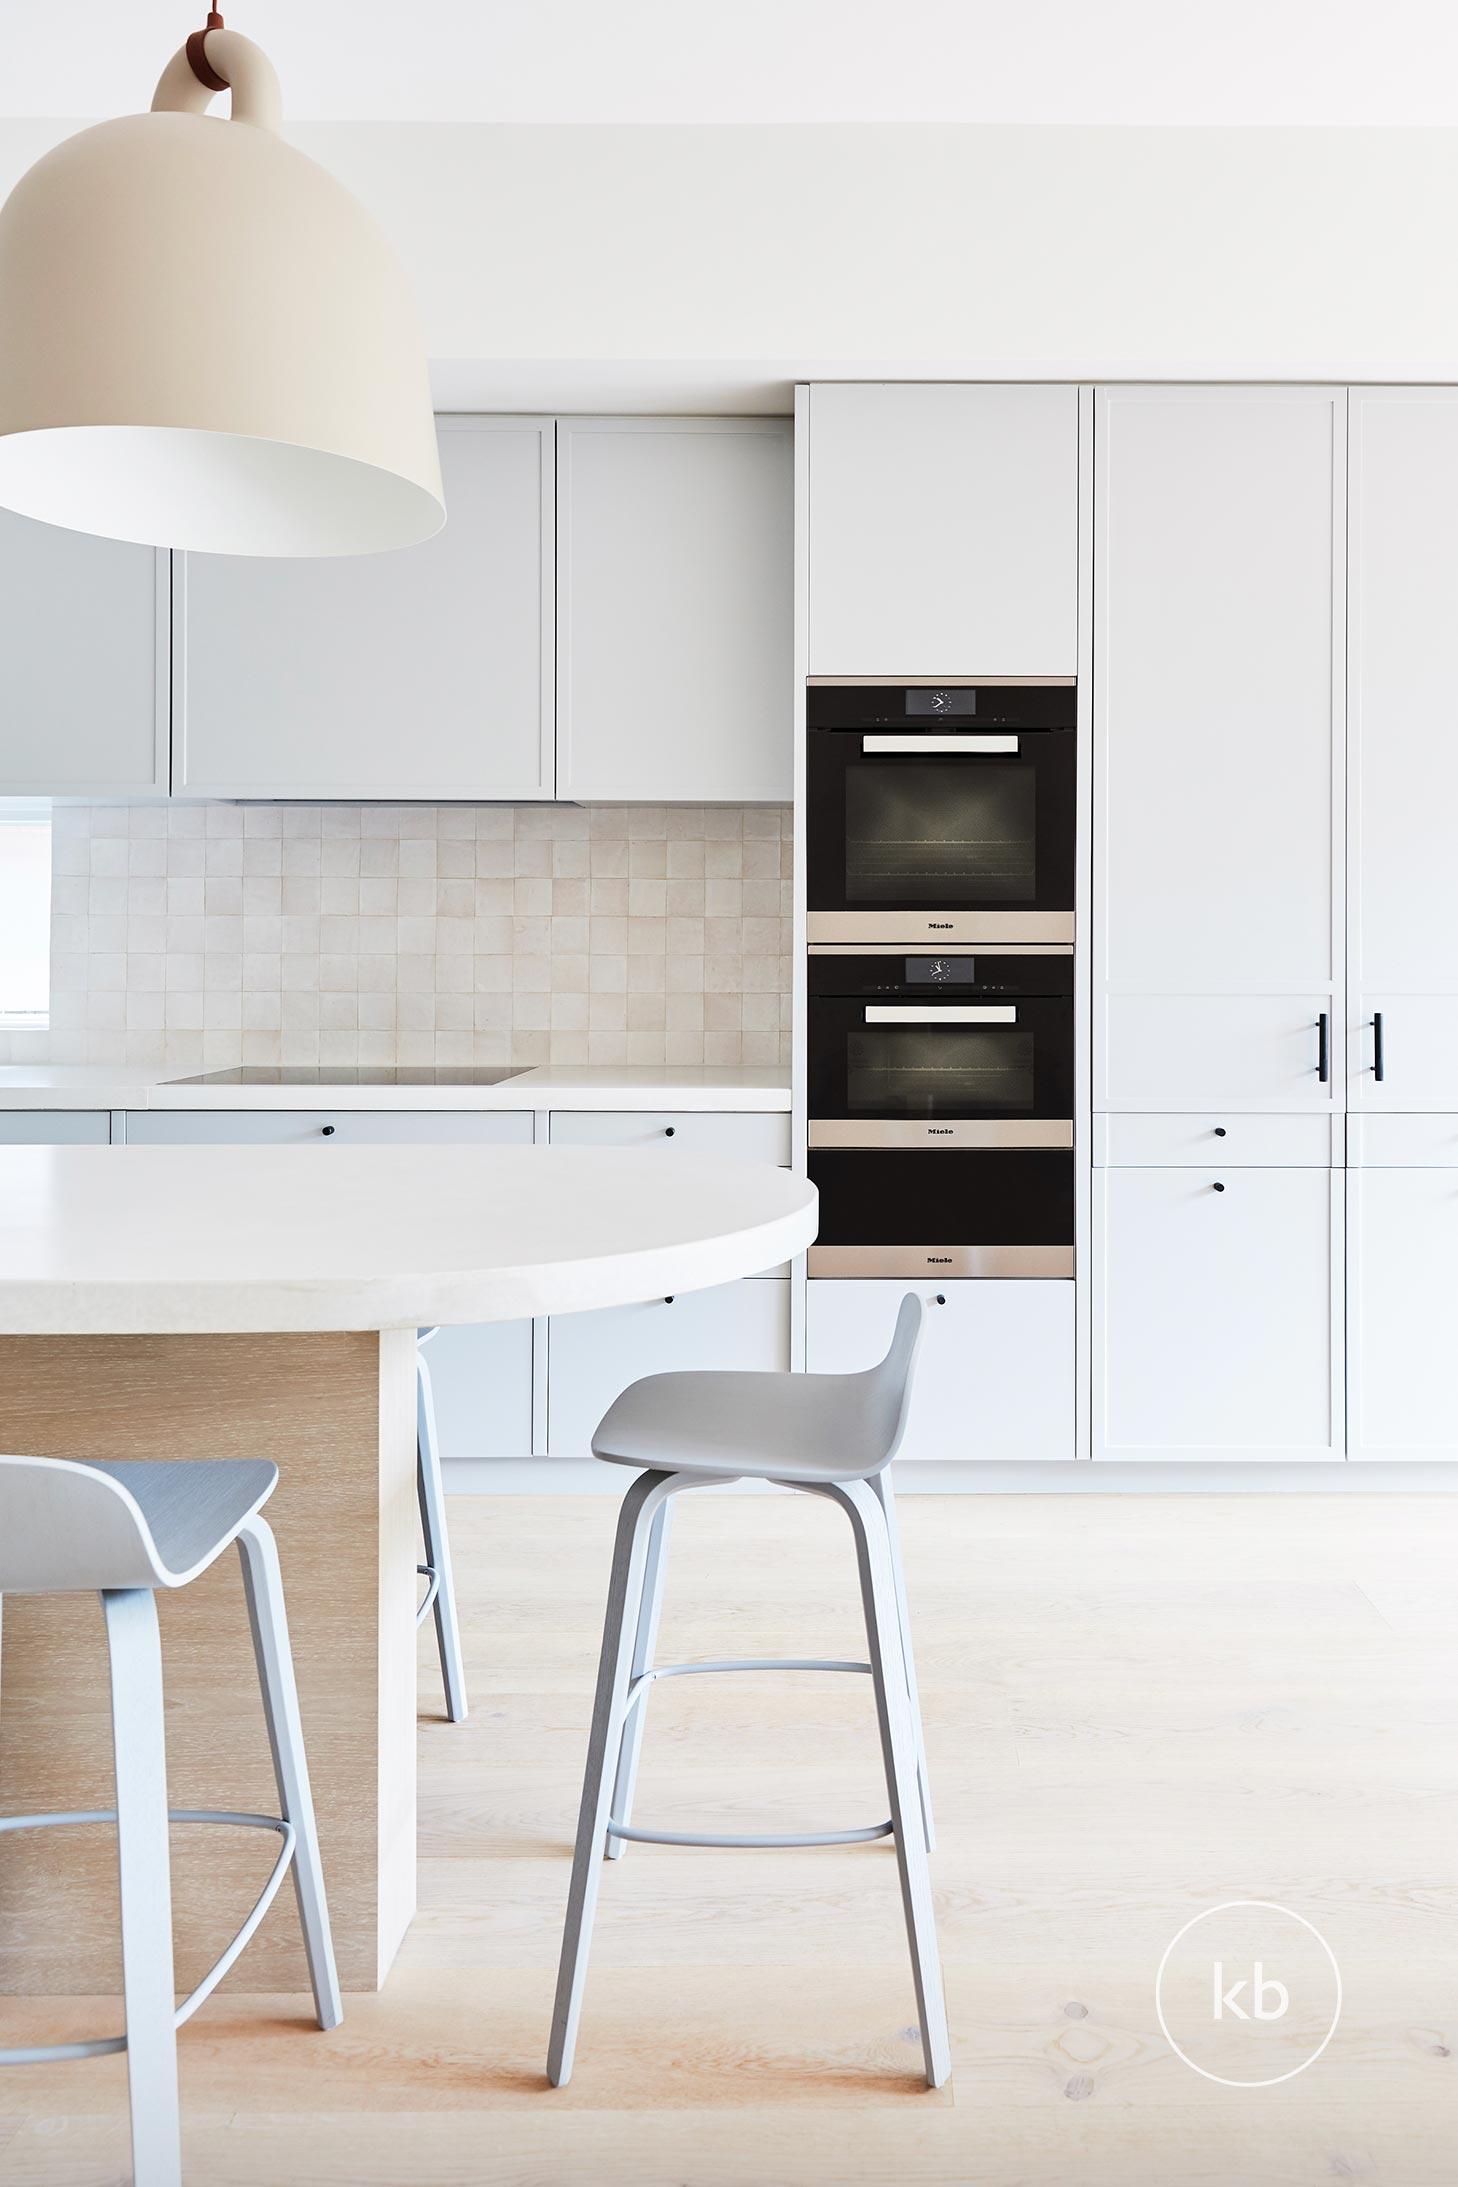 ©-Kate-Bell-Interior-Architecture-&-Design-06-North-Bondi-Project-Kitchen-04.jpg